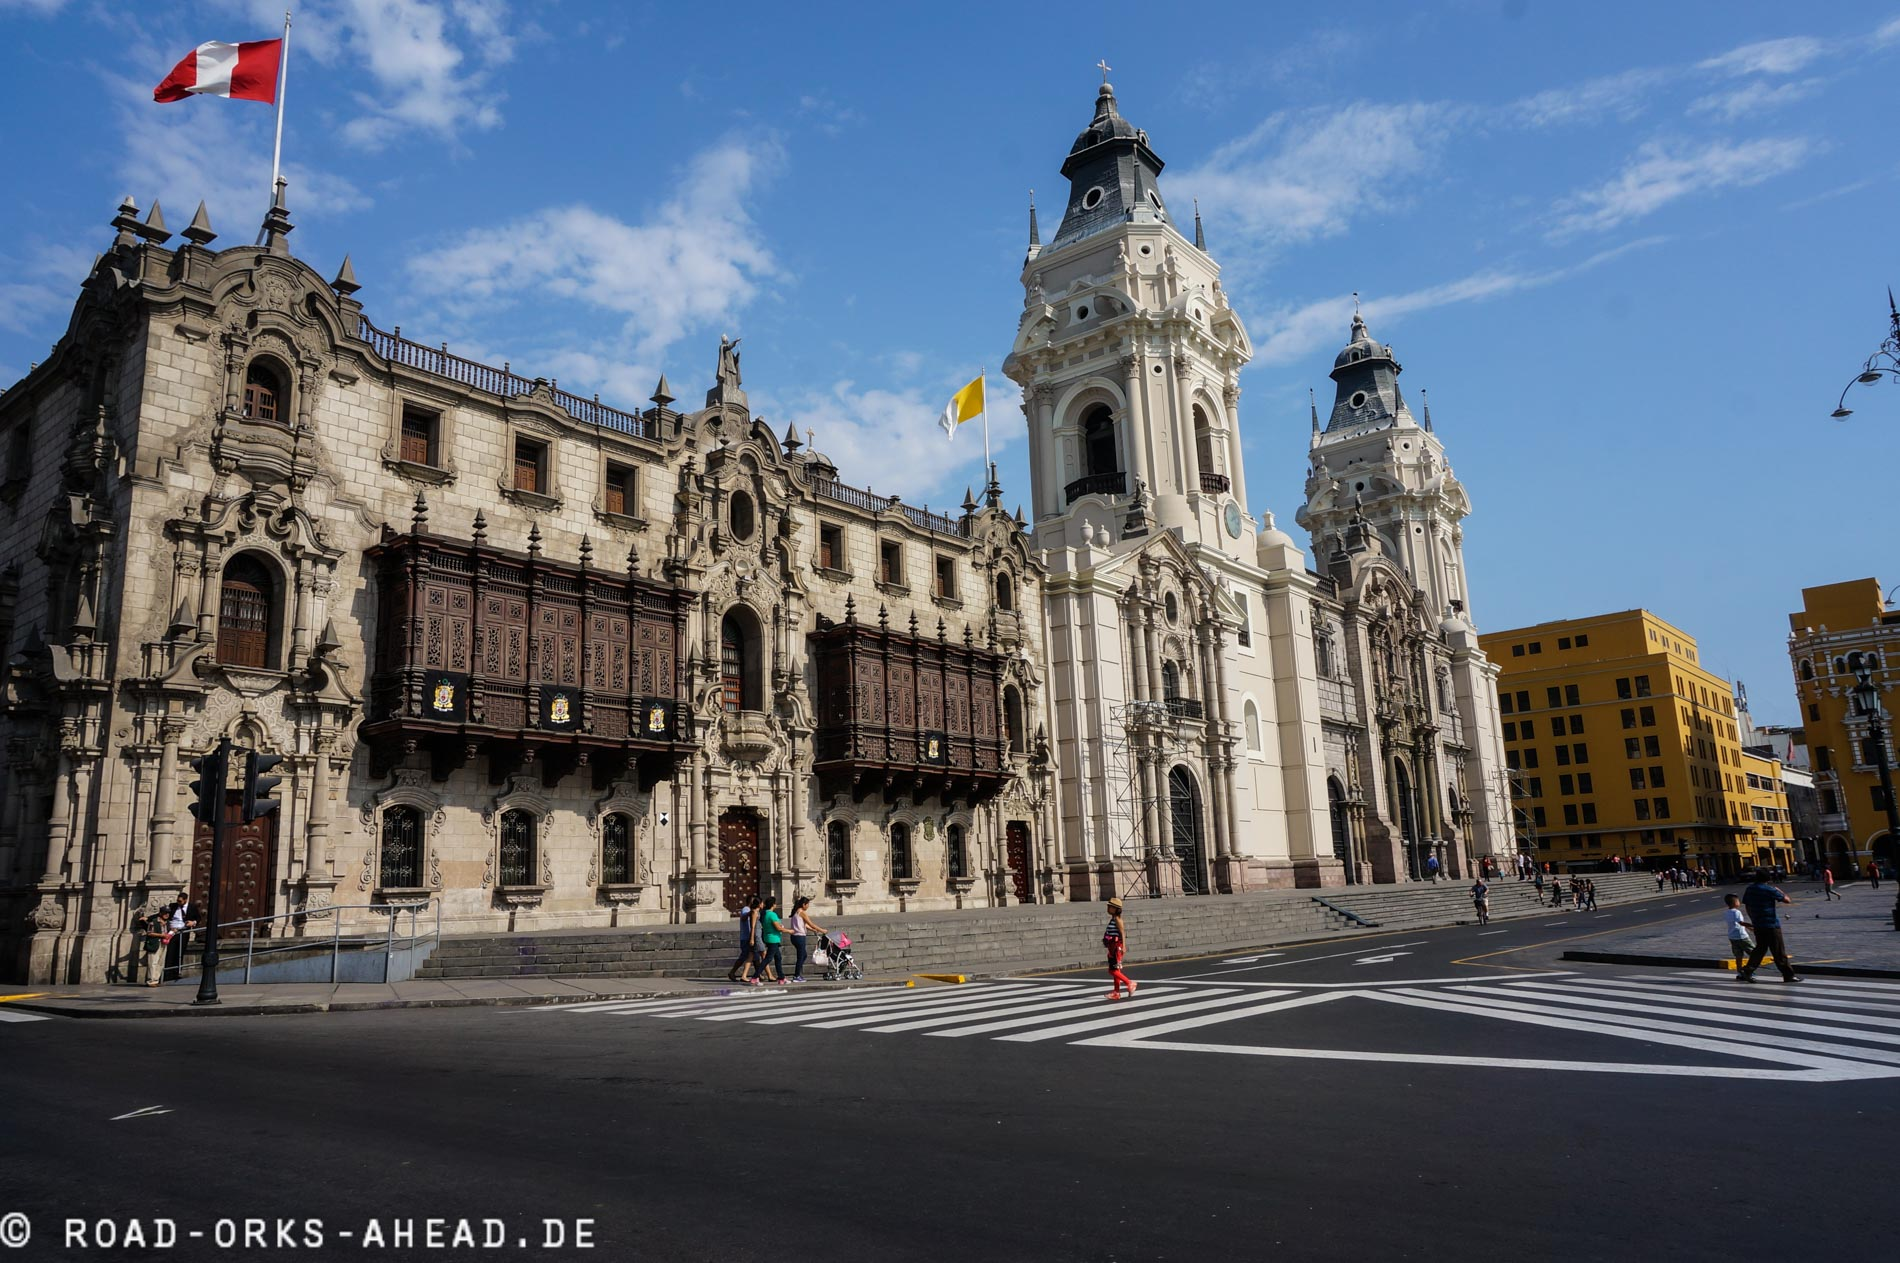 Koloniale Gebäude sind sehr cool!